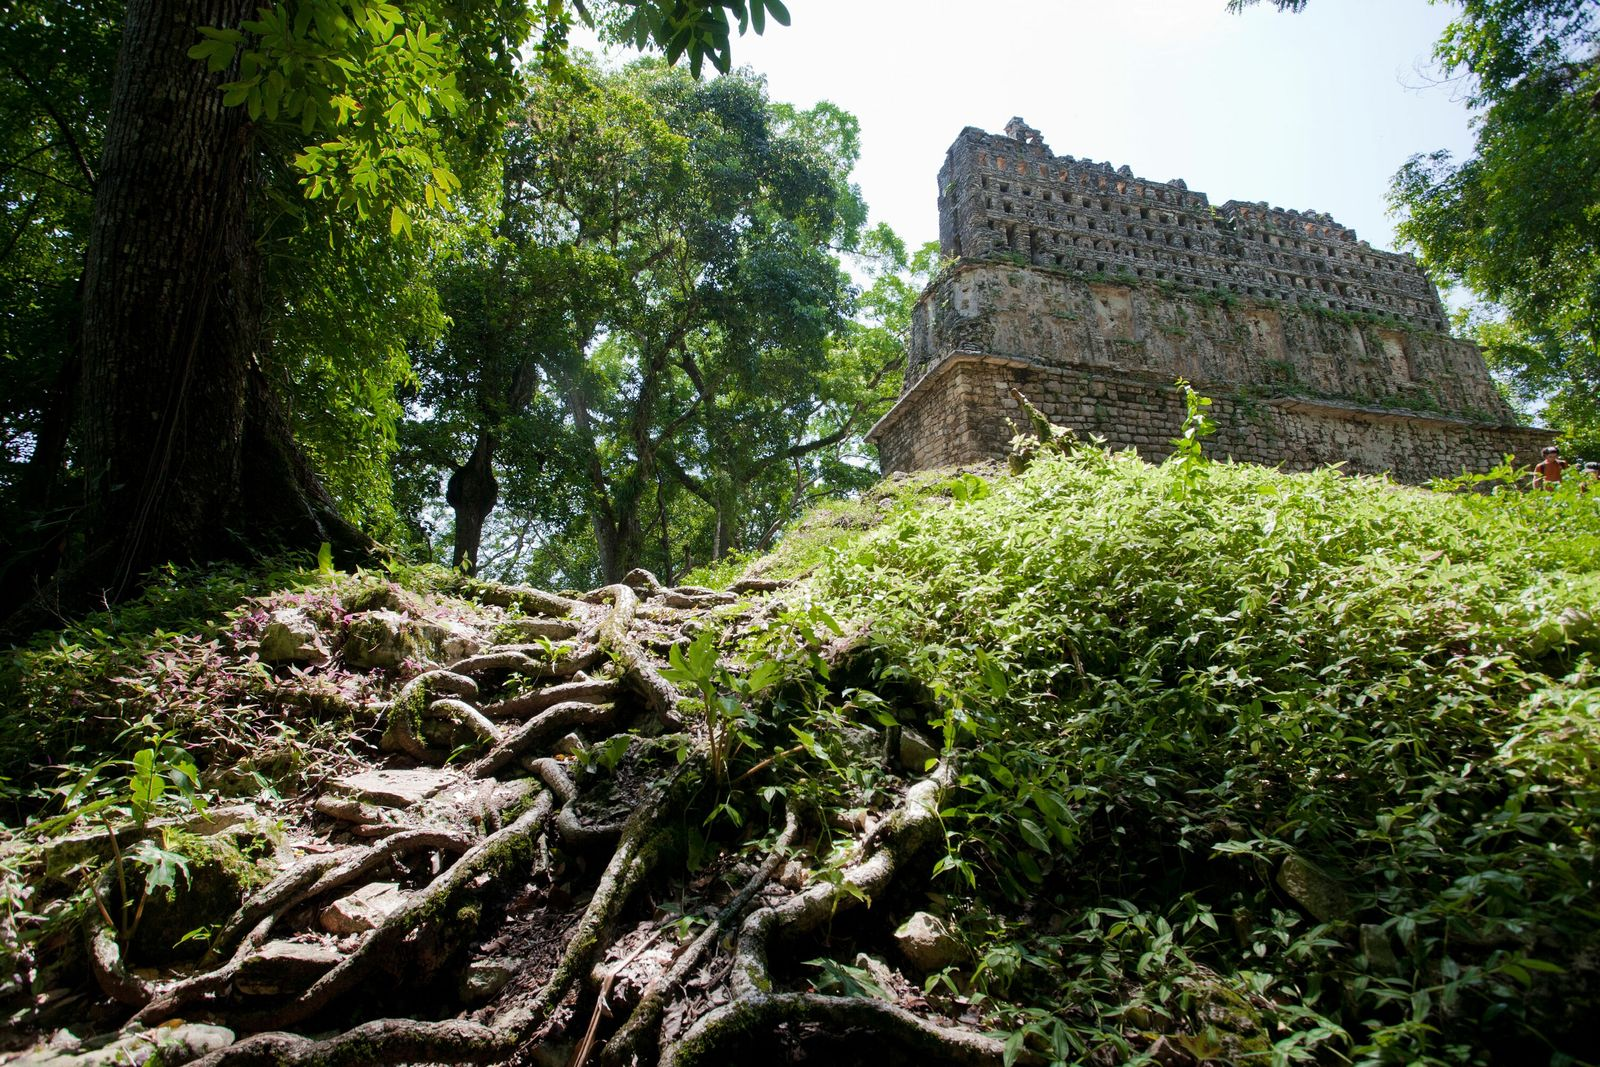 The citadel of Yaxchilan.